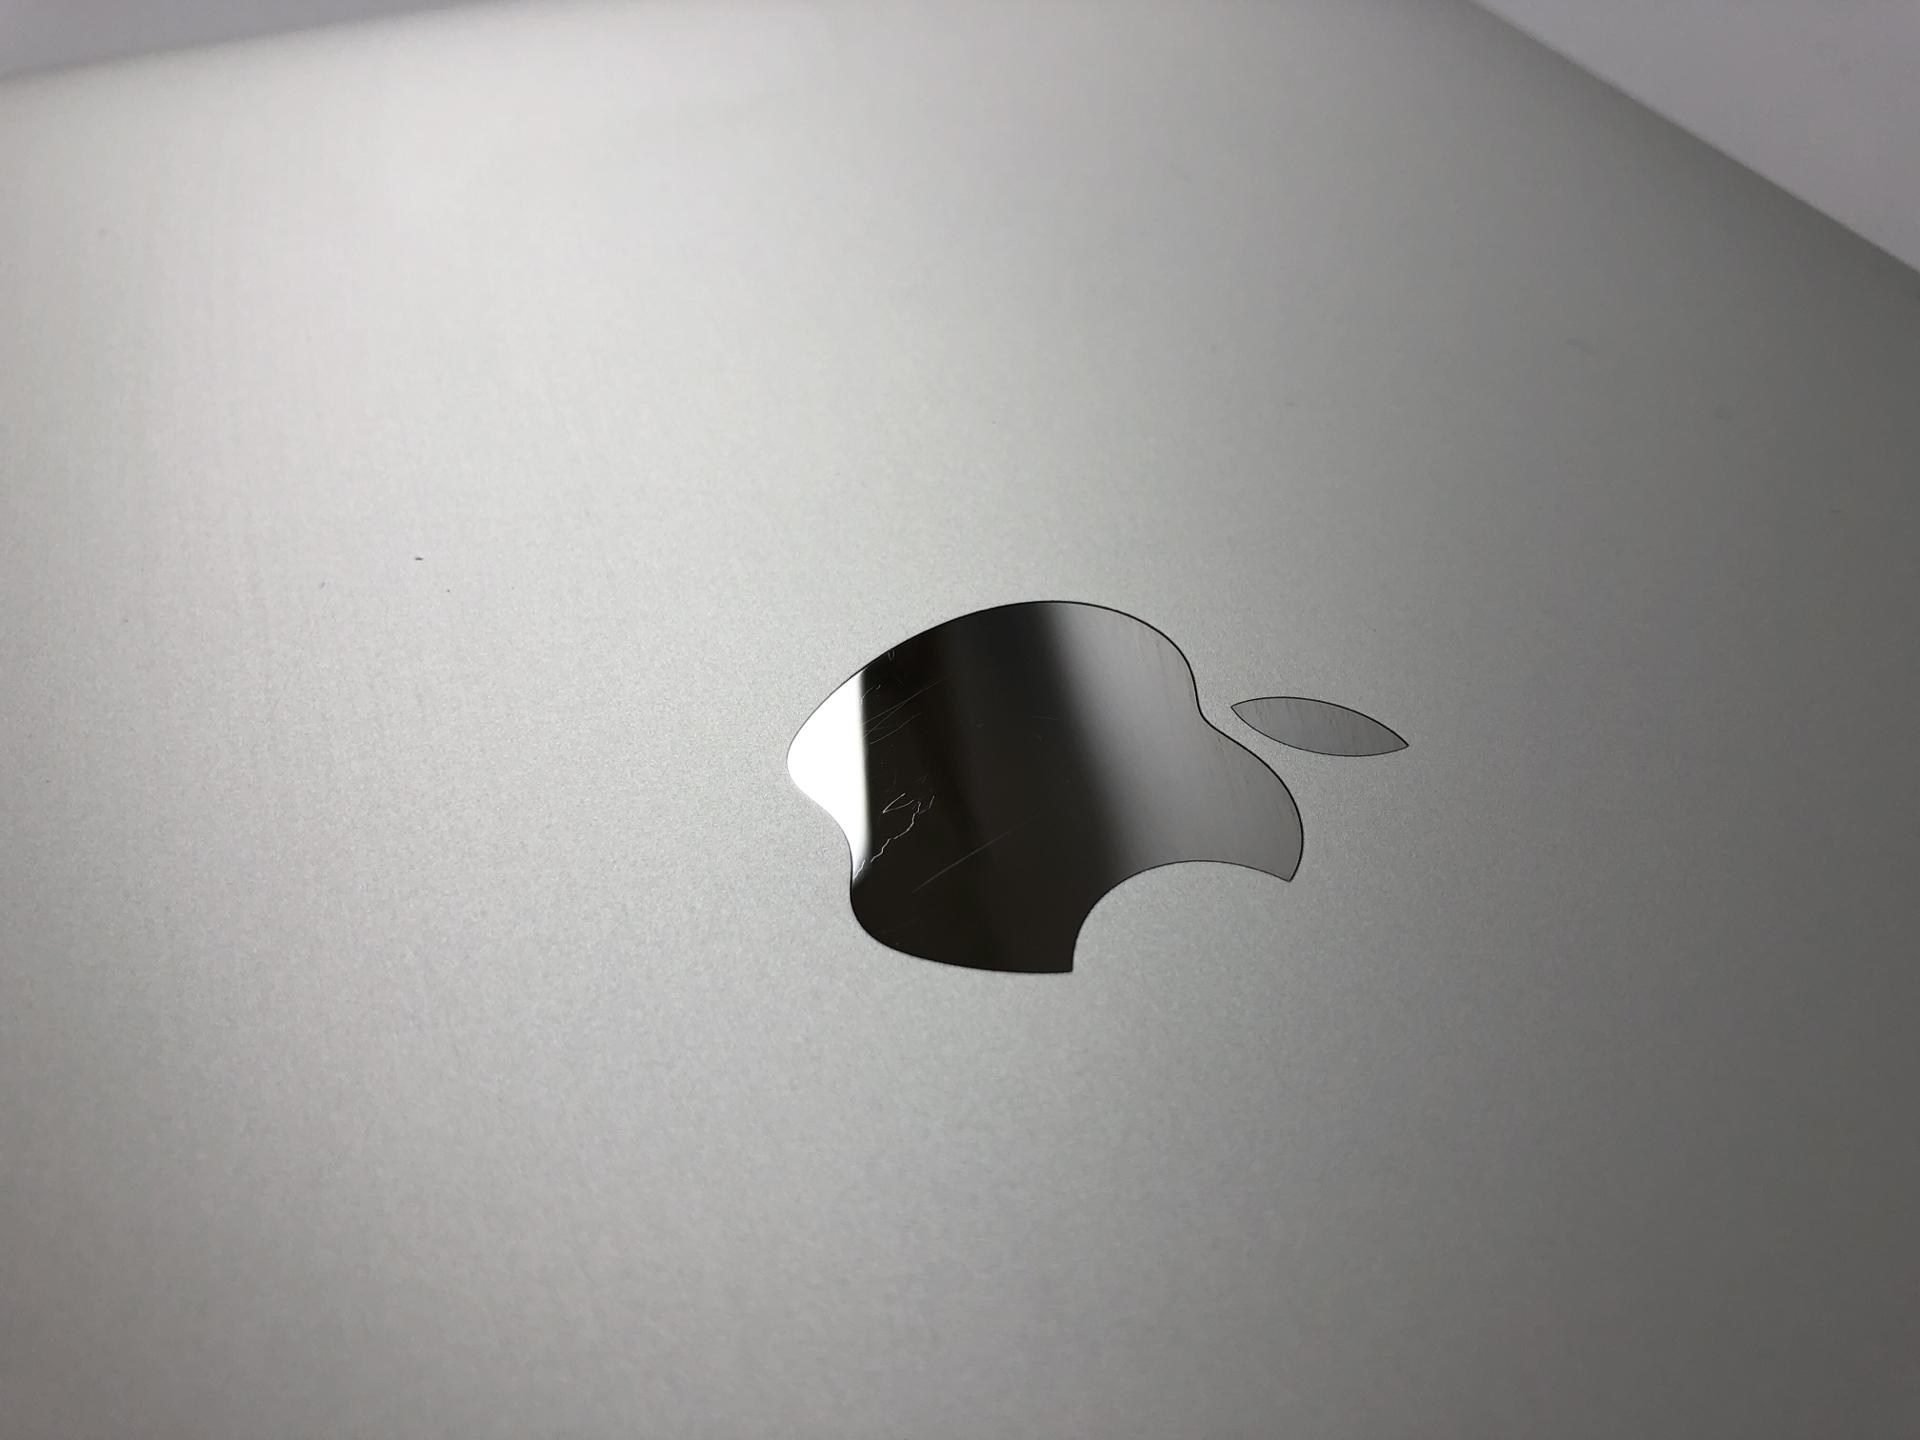 "MacBook Pro 13"" 4TBT Late 2016 (Intel Core i5 2.9 GHz 16 GB RAM 512 GB SSD), Silver, Intel Core i5 2.9 GHz, 16 GB RAM, 512 GB SSD, bild 3"